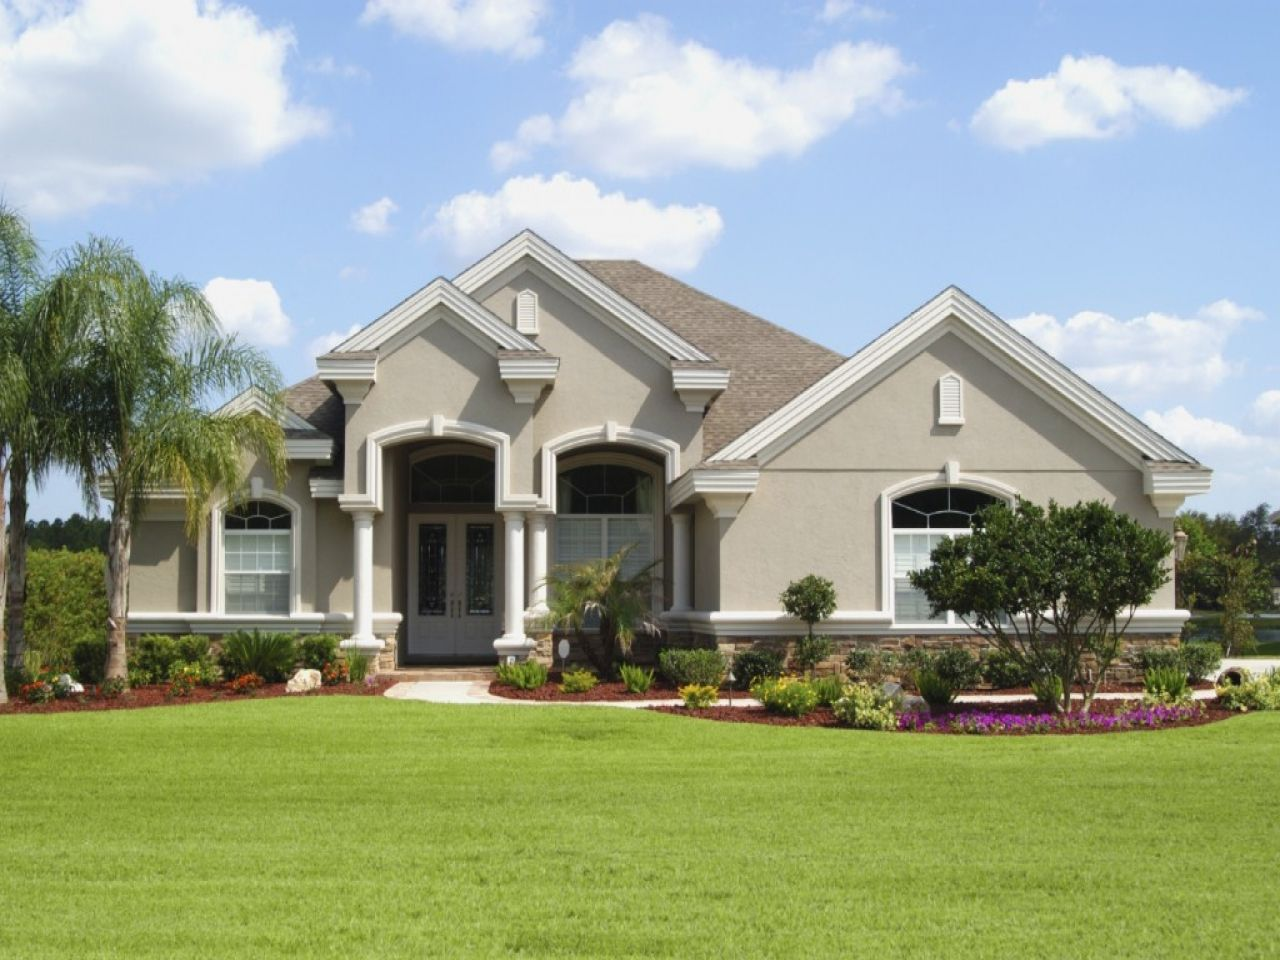 explore stucco house colors stucco houses and more - Stucco Exterior Paint Color Schemes